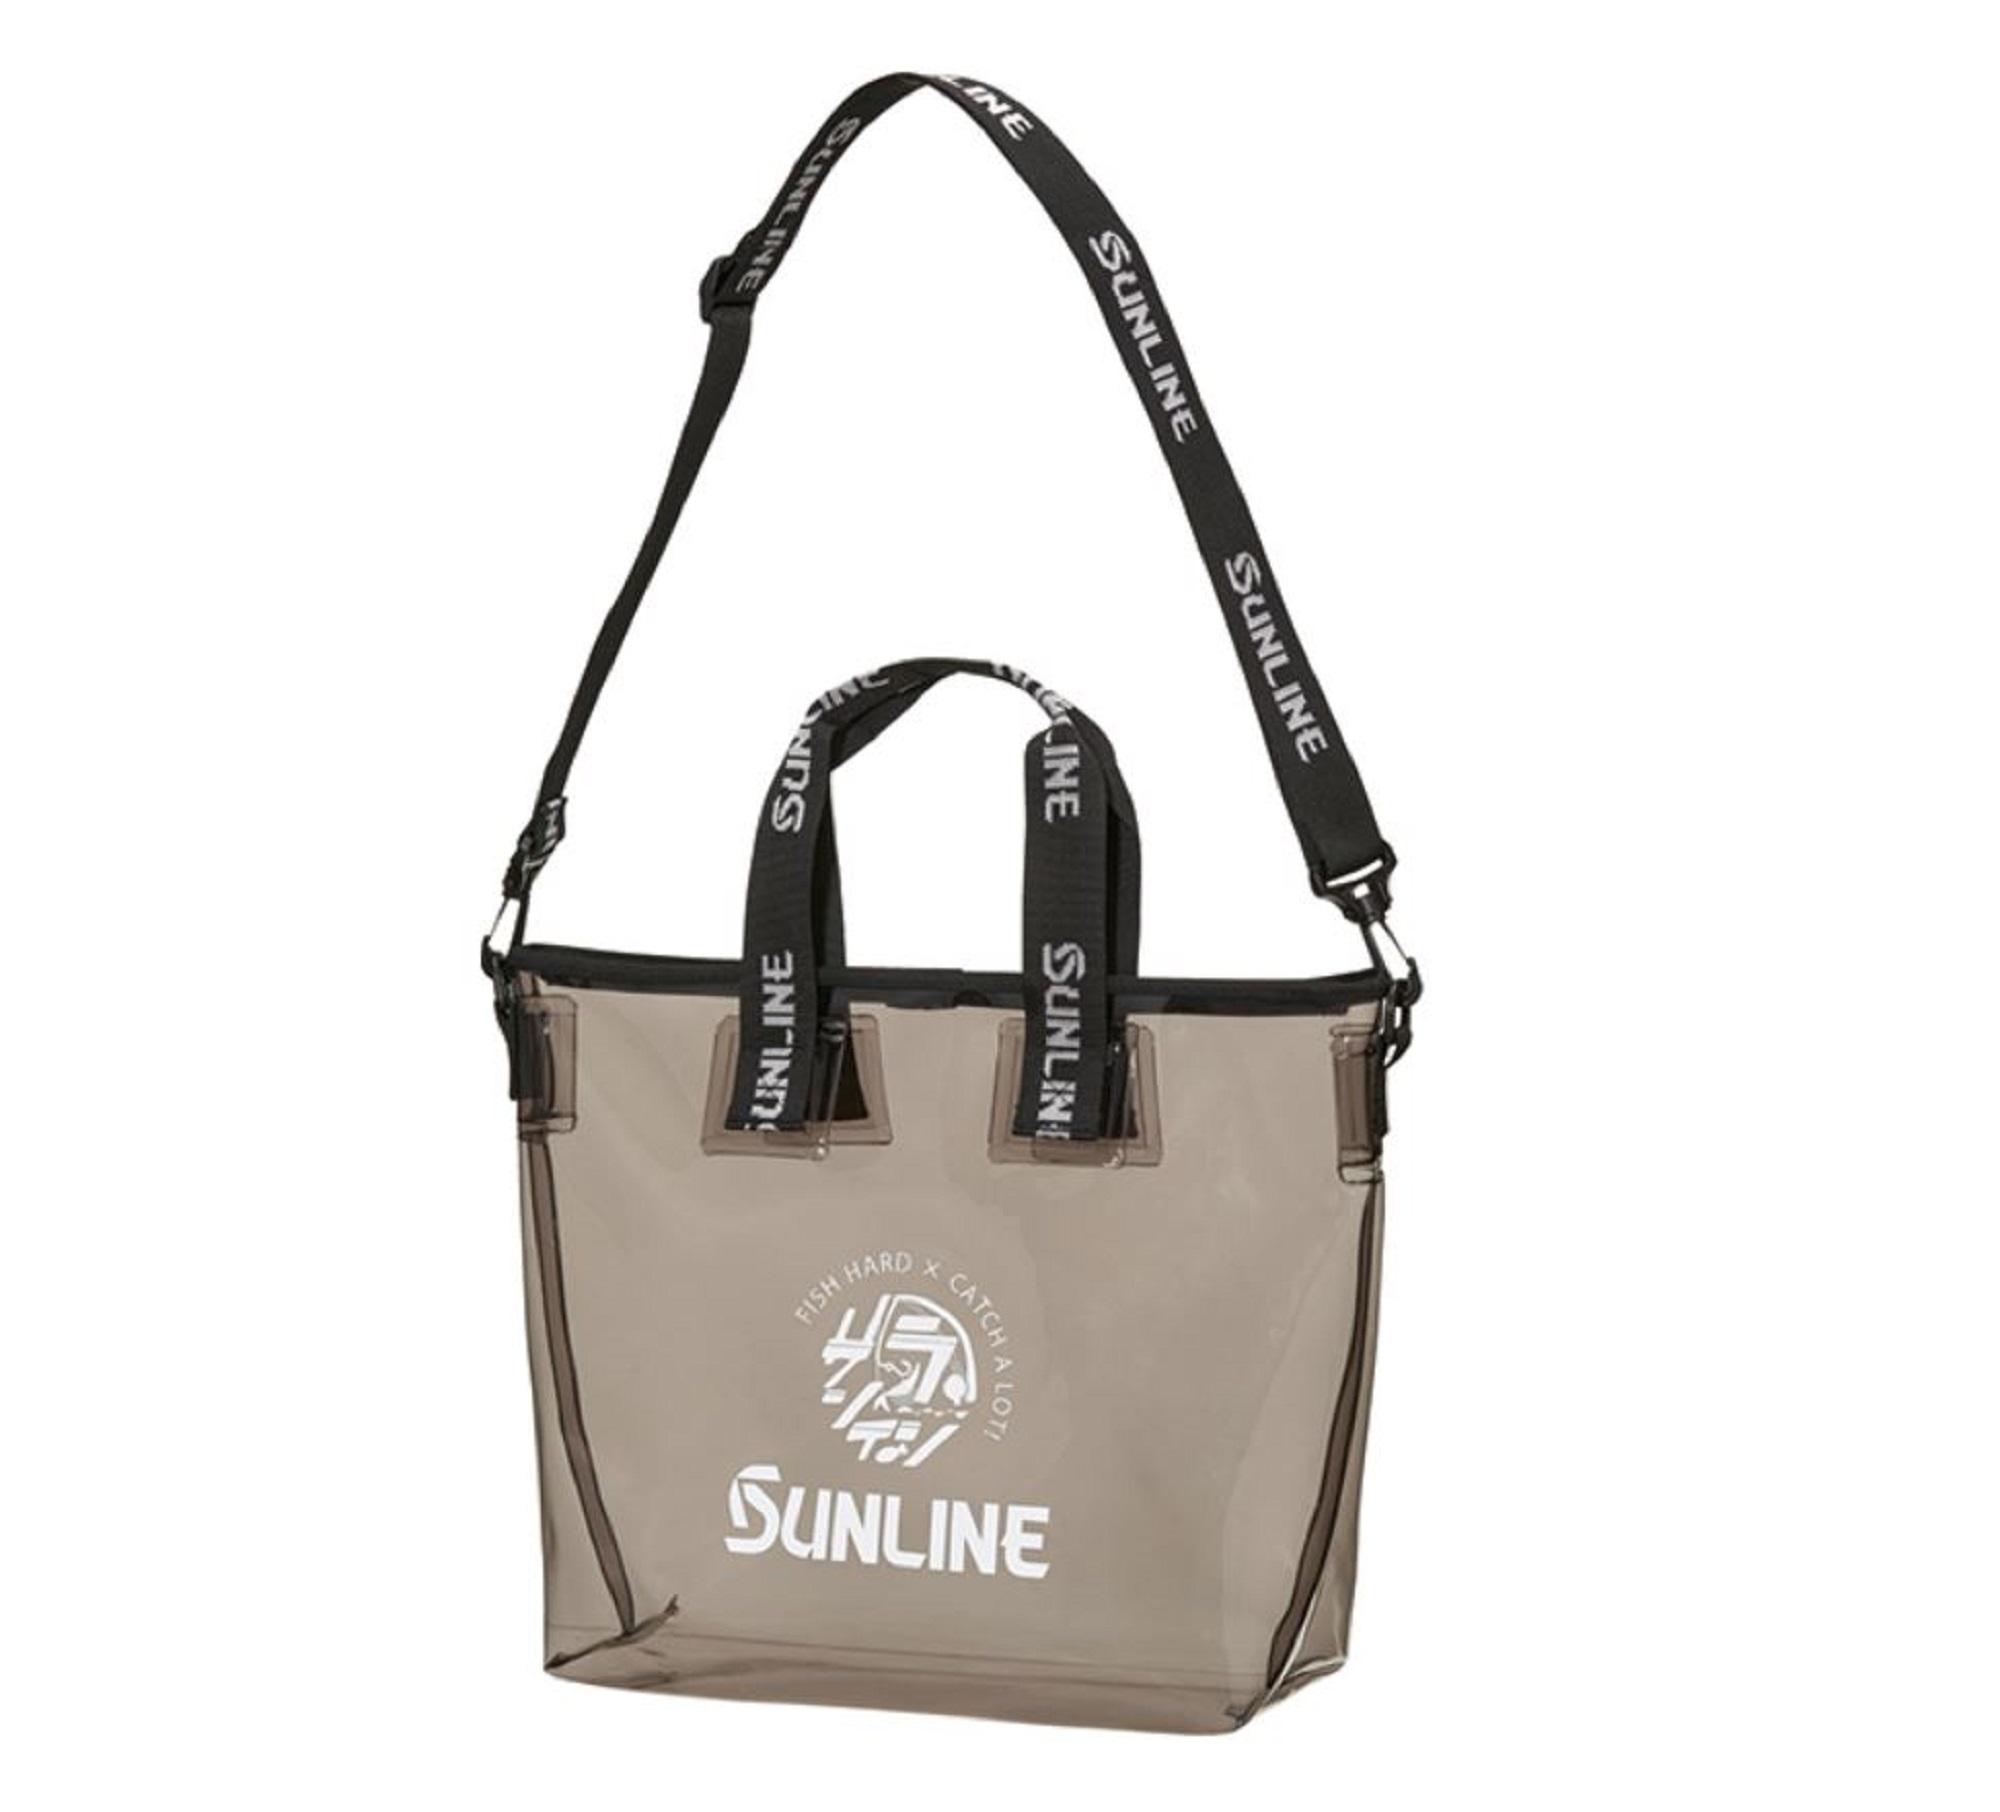 Sunline SFB-0720 Shoulder Bag 340 x 335 x 145 mm Smoke (4986)